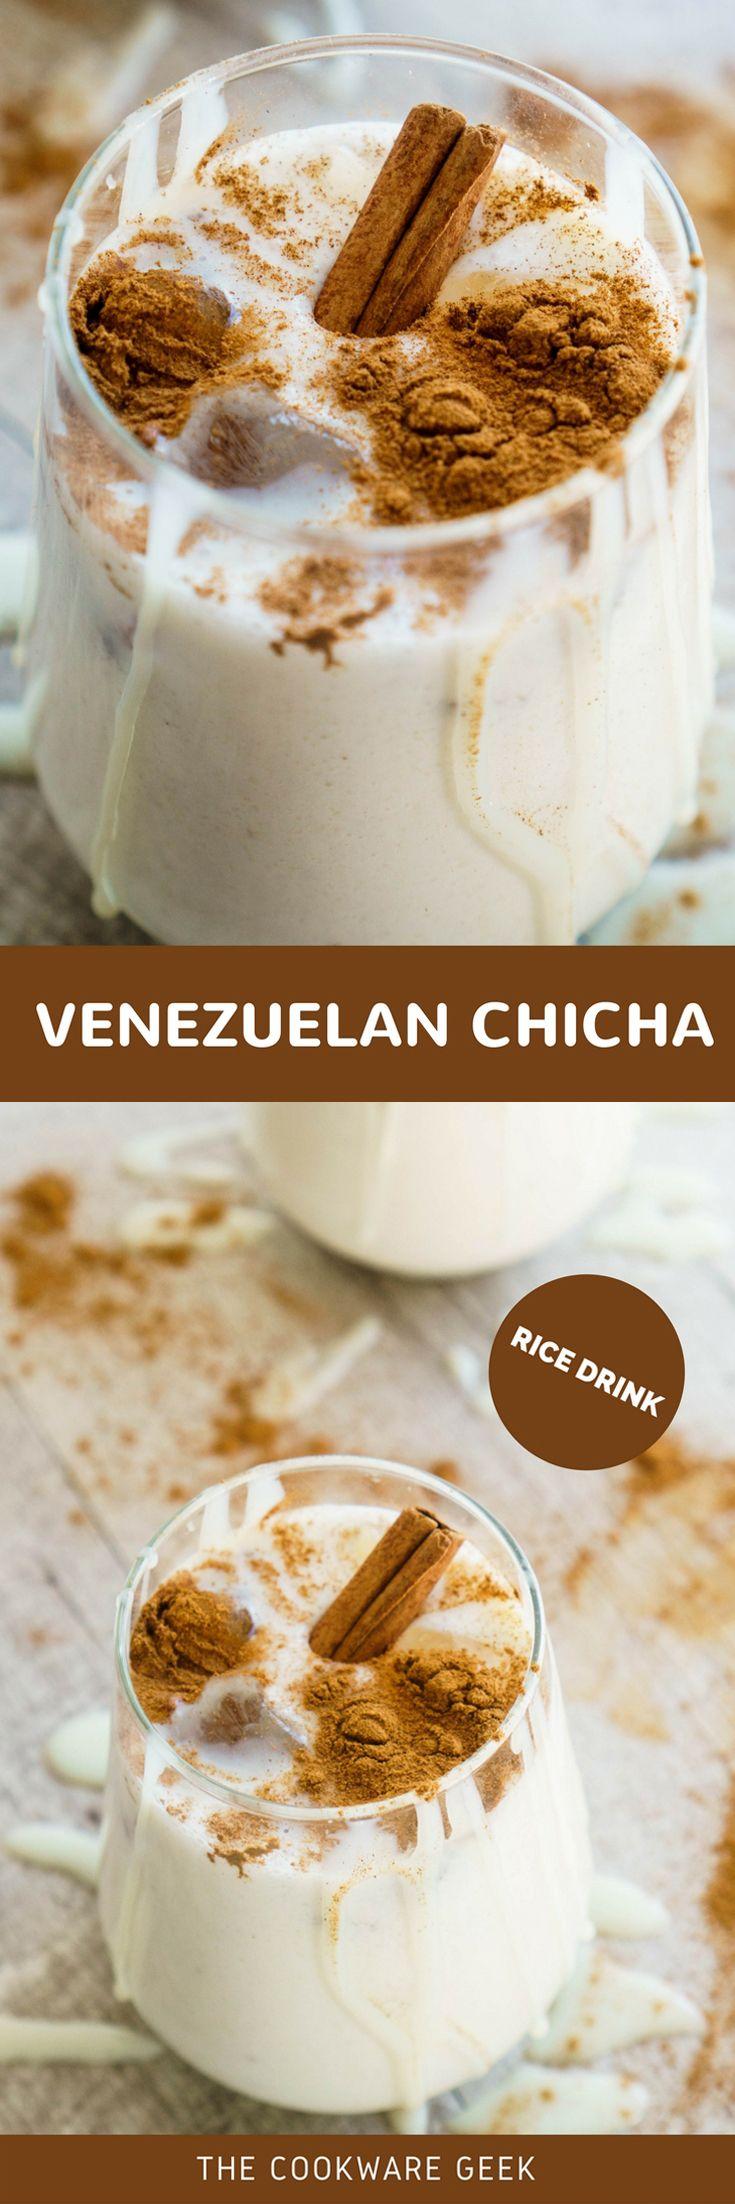 Venezuelan Chicha (Rice Drink) | The Cookware Geek